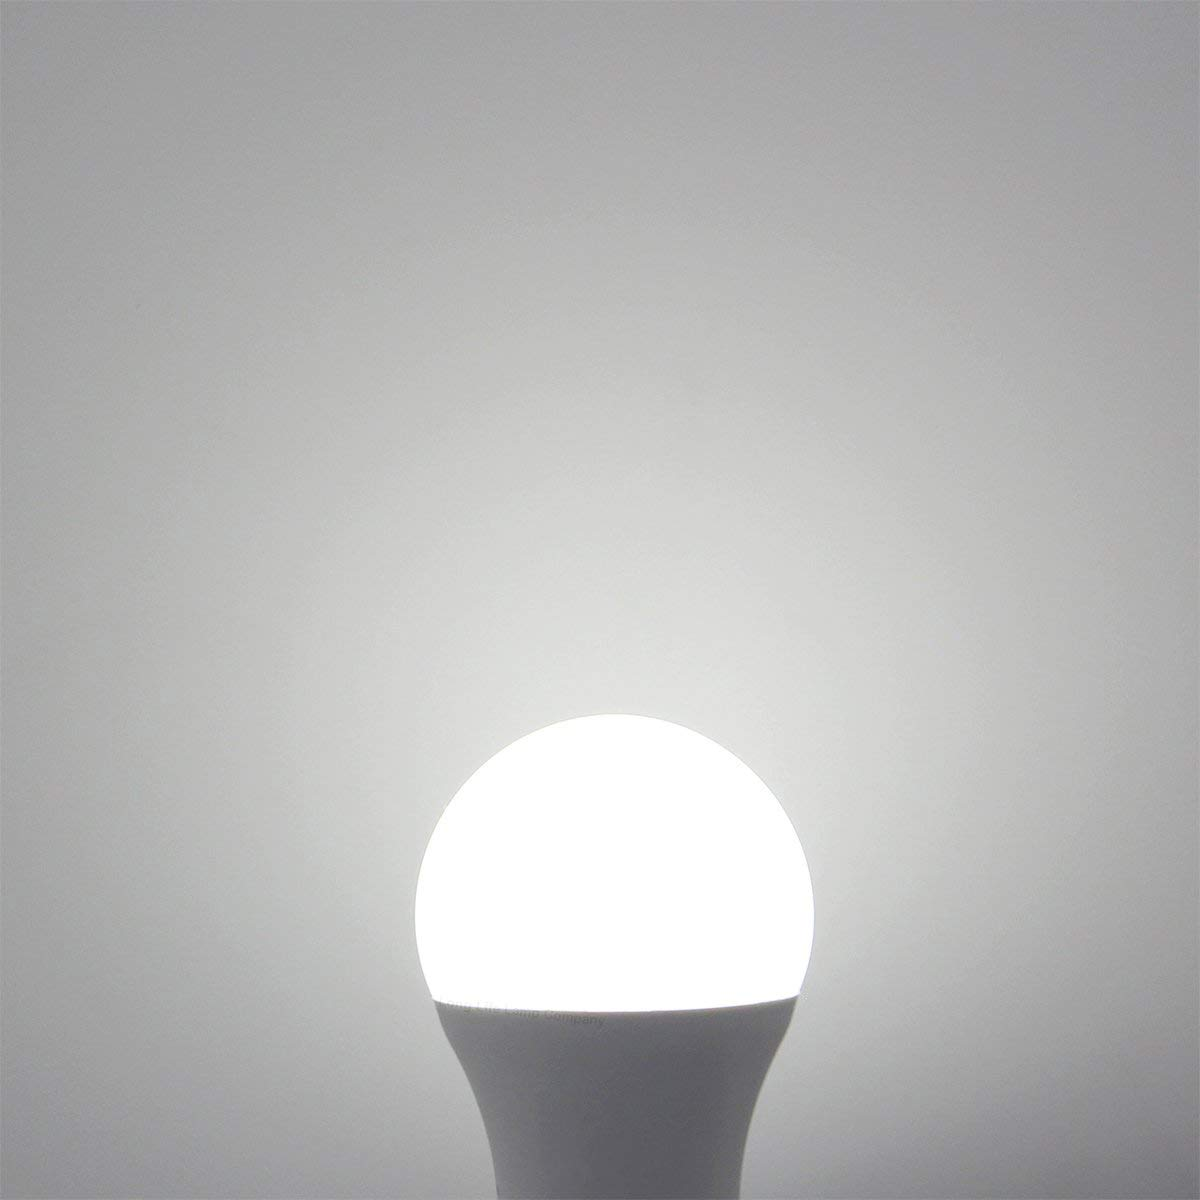 YAYZA! 1-Paquete E27 ES Rosca Edison 10W Seguridad Toda la Noche LED A60 Bombilla Globo Sensor Fotocélula Integrado 1000lm Equivalente Incandescente ...